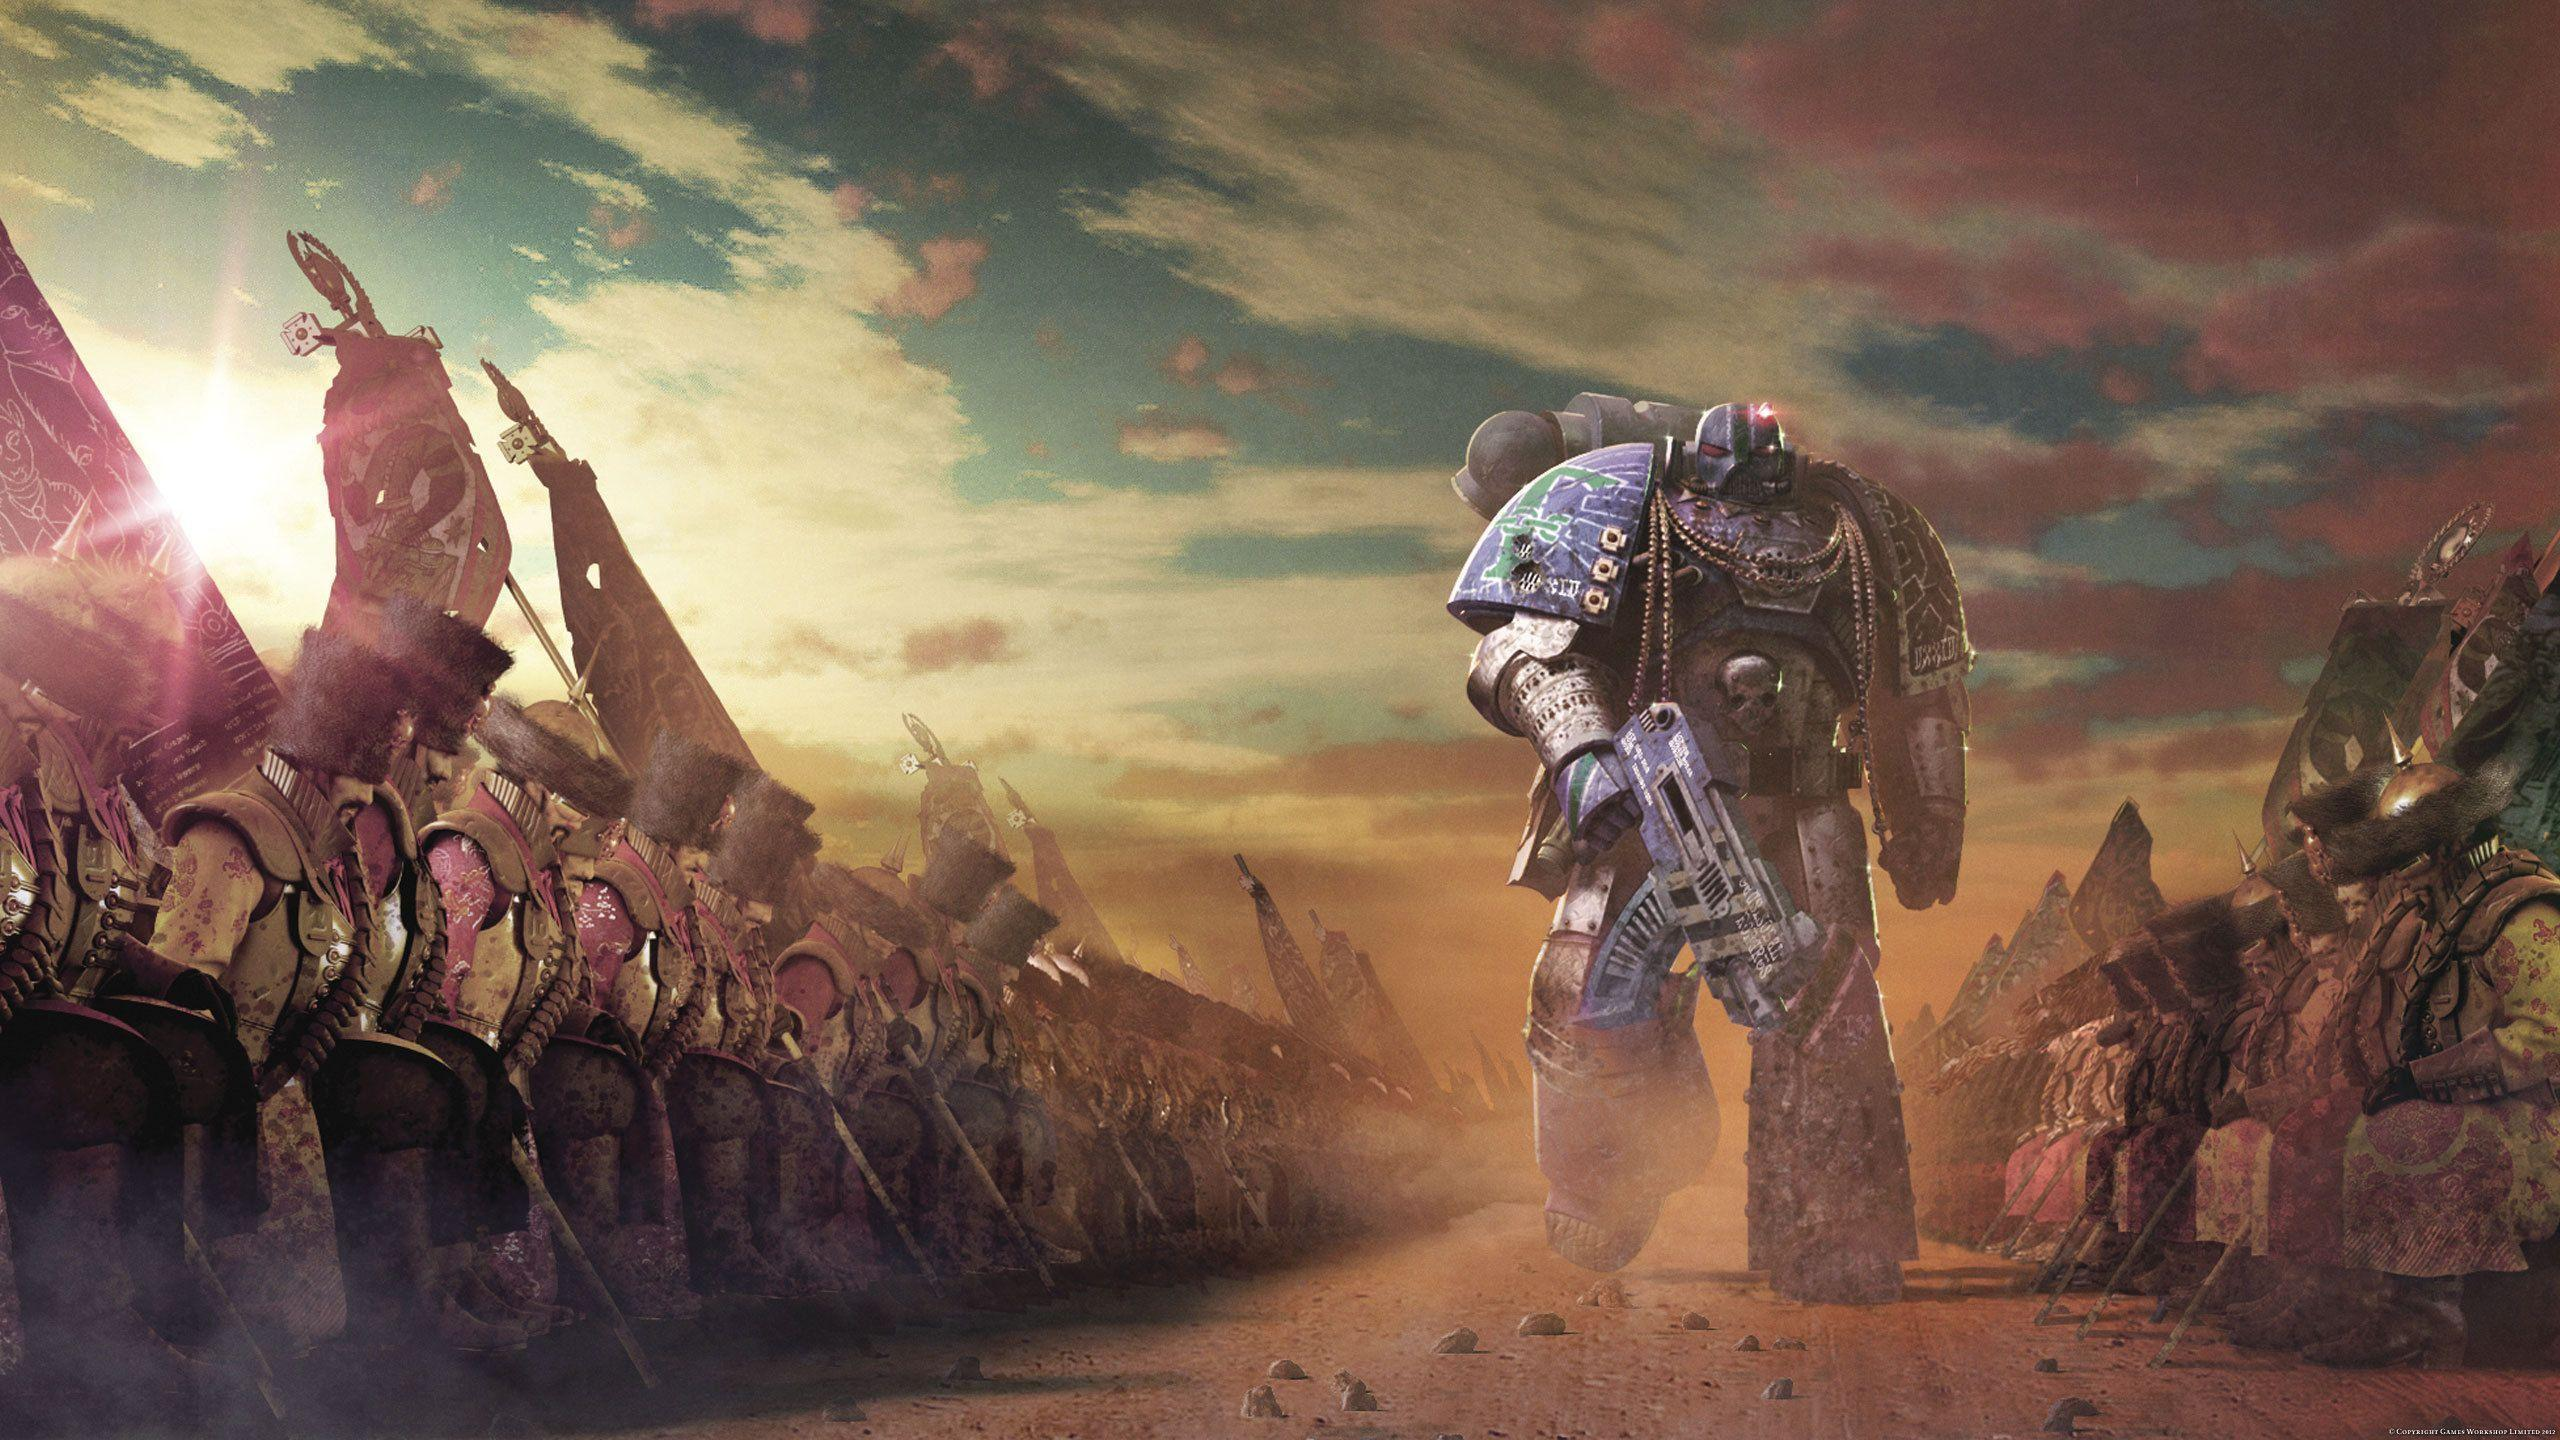 Warhammer 40k Backgrounds Wallpaper Cave